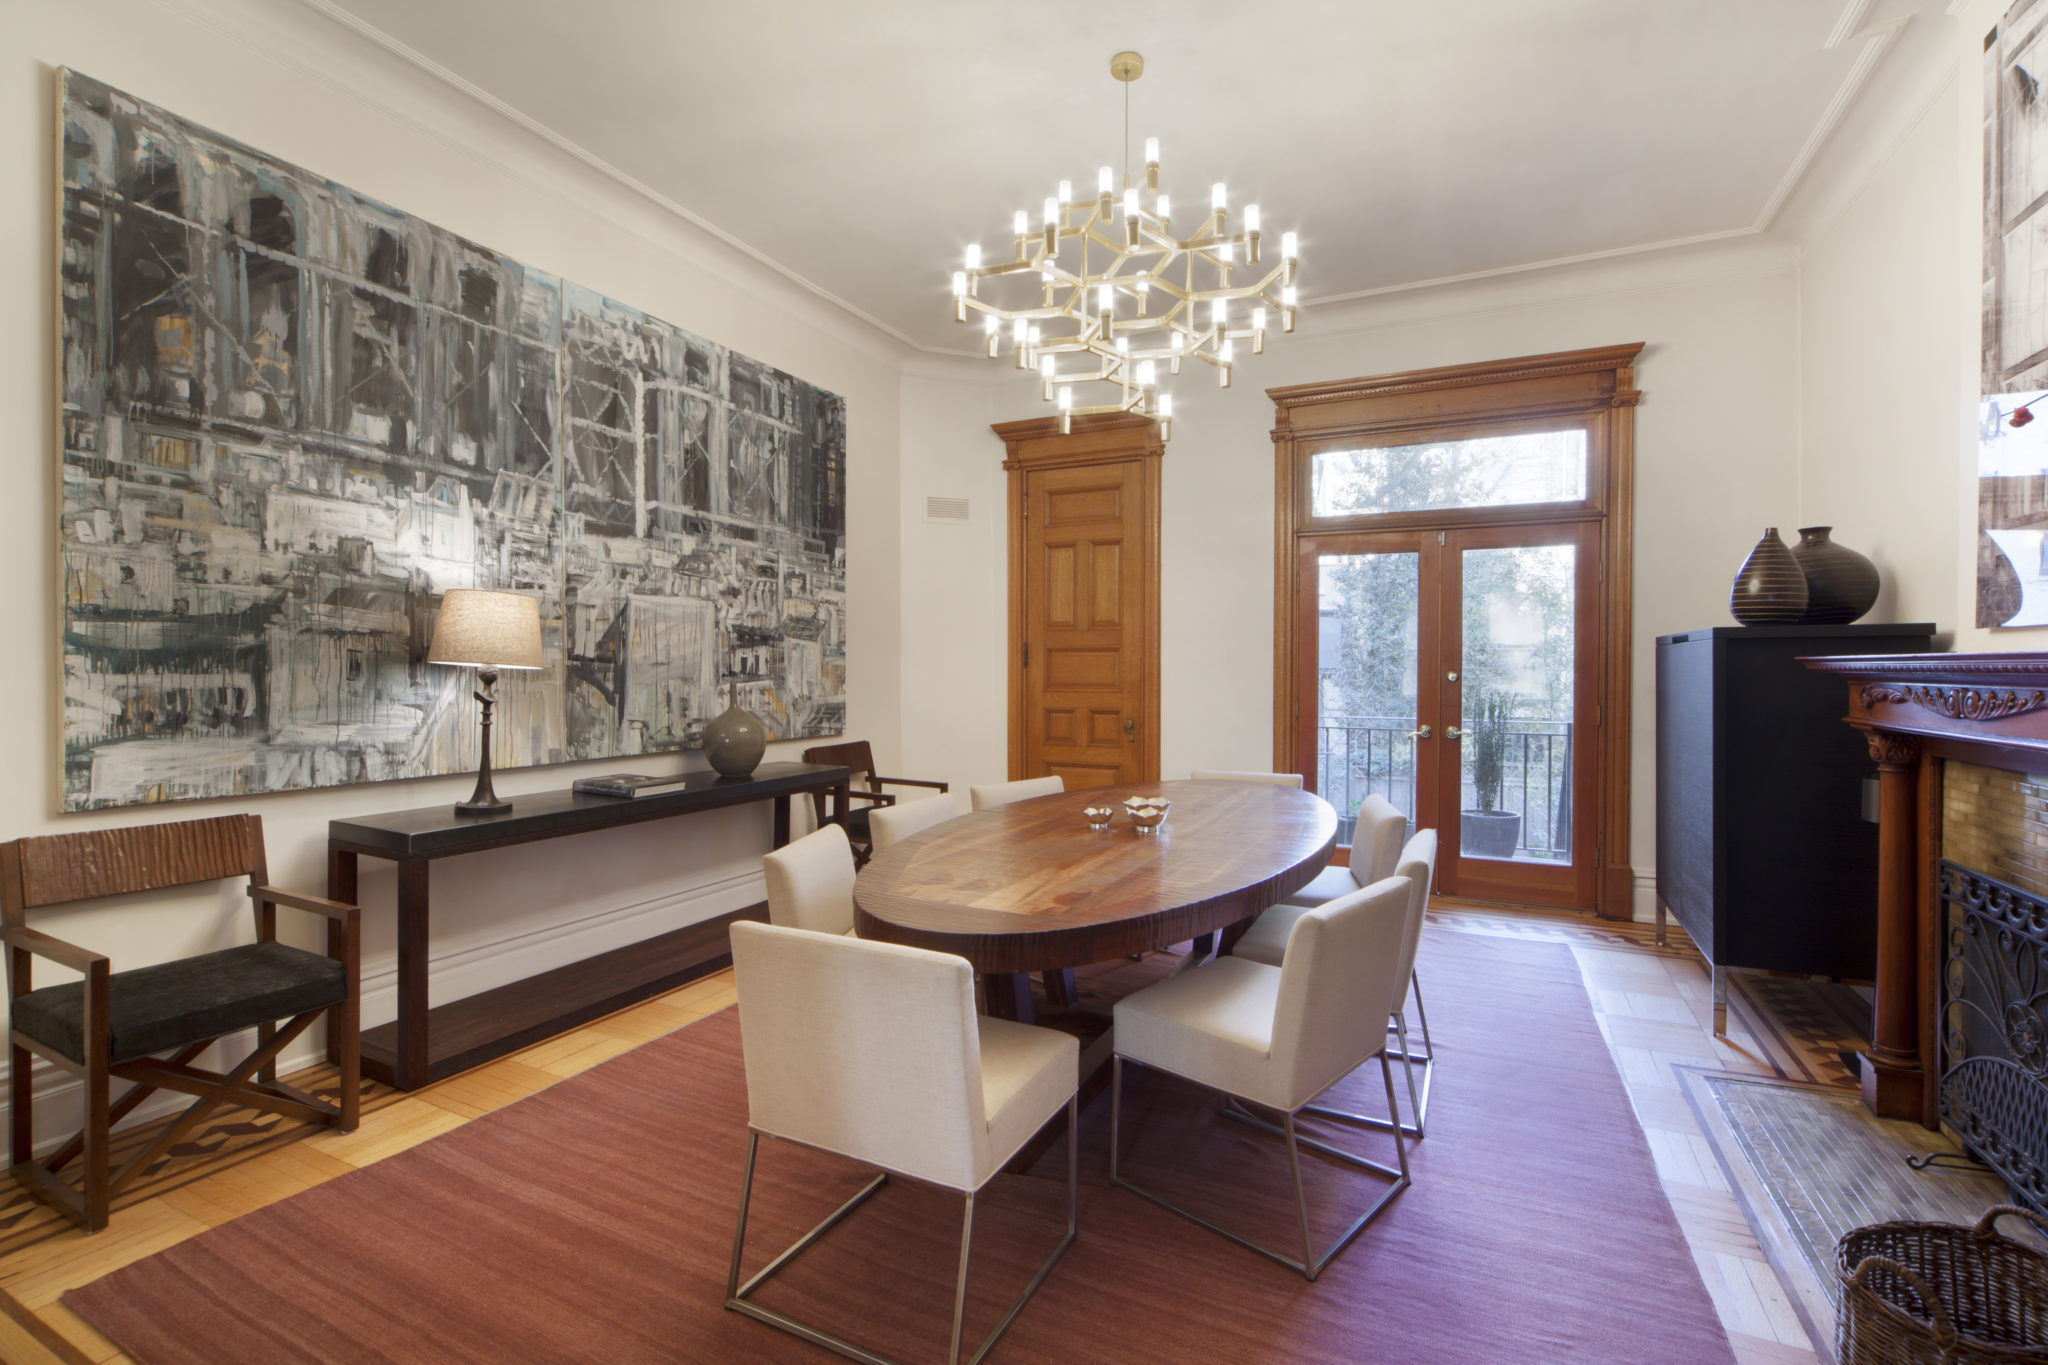 Luxury listing: Upper West Side brownstone